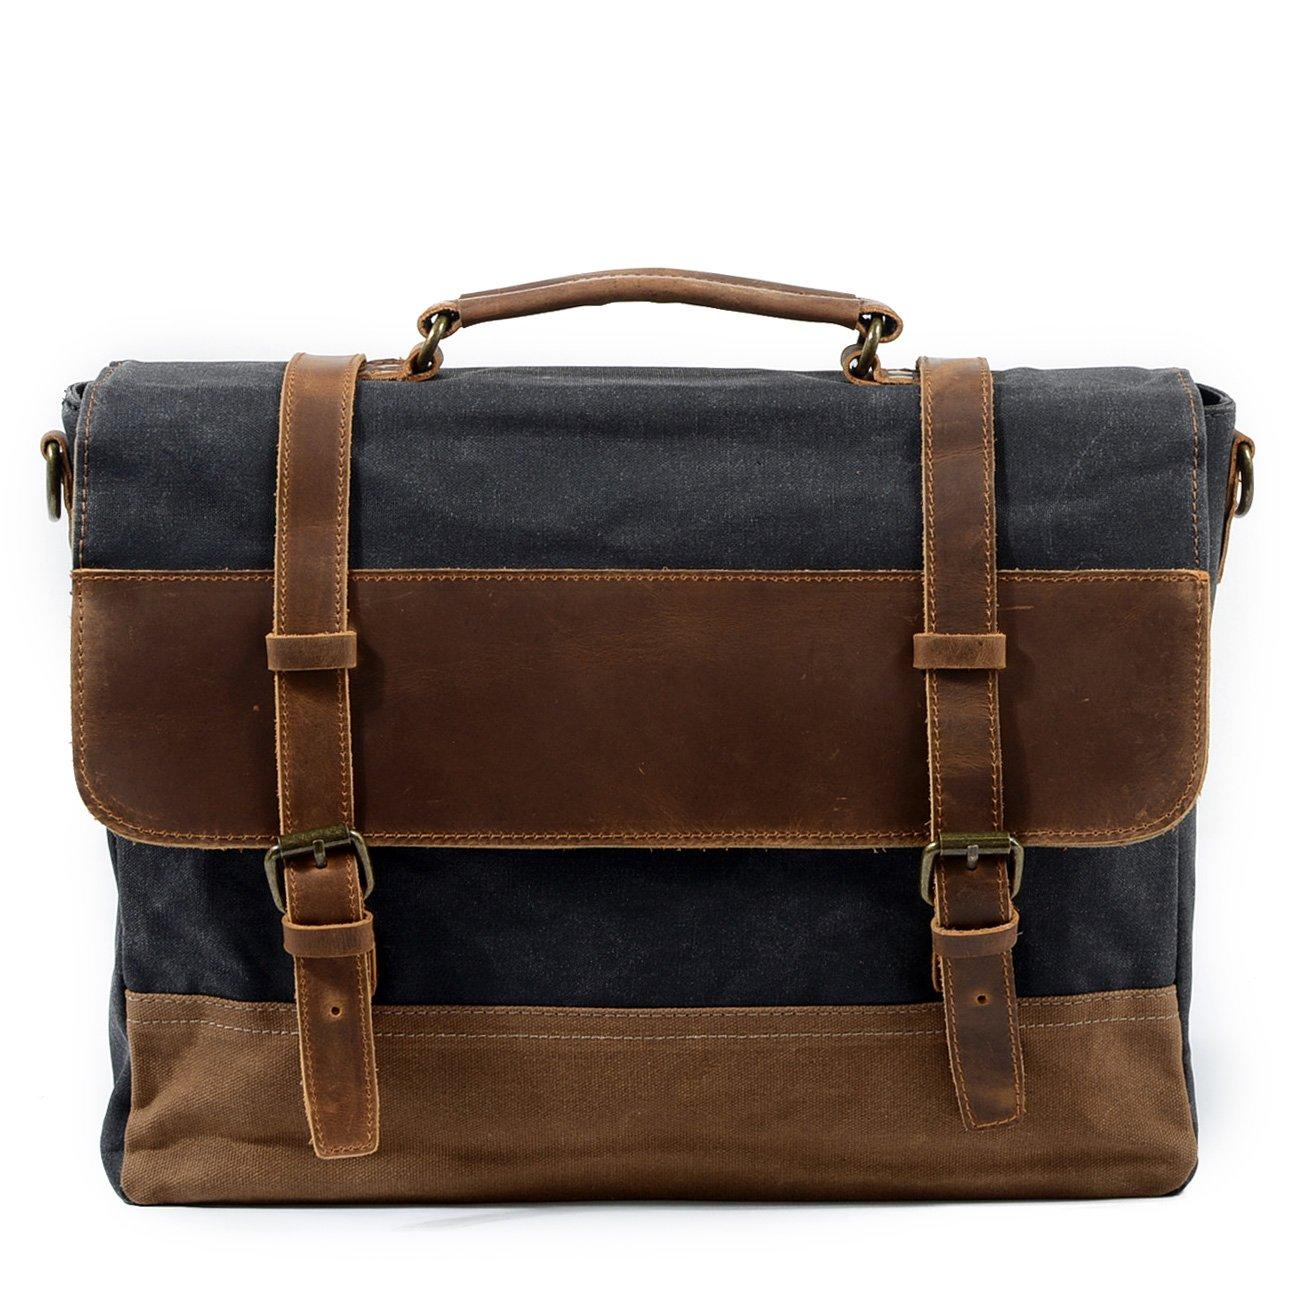 Mens Vintage Retro Genuine Leather Messenger Bag Waterproof Canvas Leather Computer Laptop Bag 15 Inch Briefcase Case (Dark Grey)